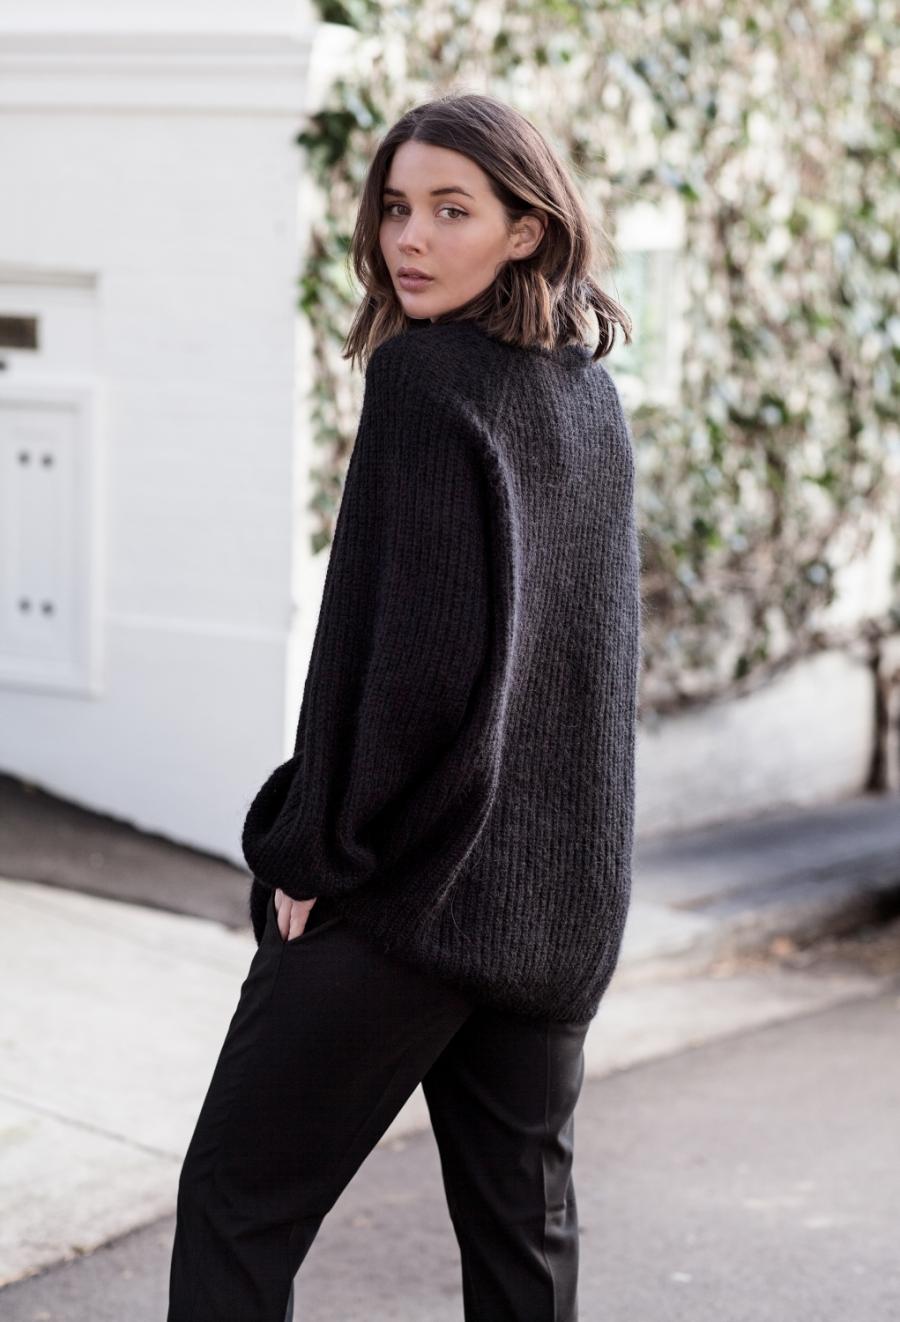 harperandharley_how-to-wear-oversized_black-jumper_outfit_streetstyle_4-mtjoayc8chyi45f3twe7n6dsaztj42qga0u6a1qyzo.jpg